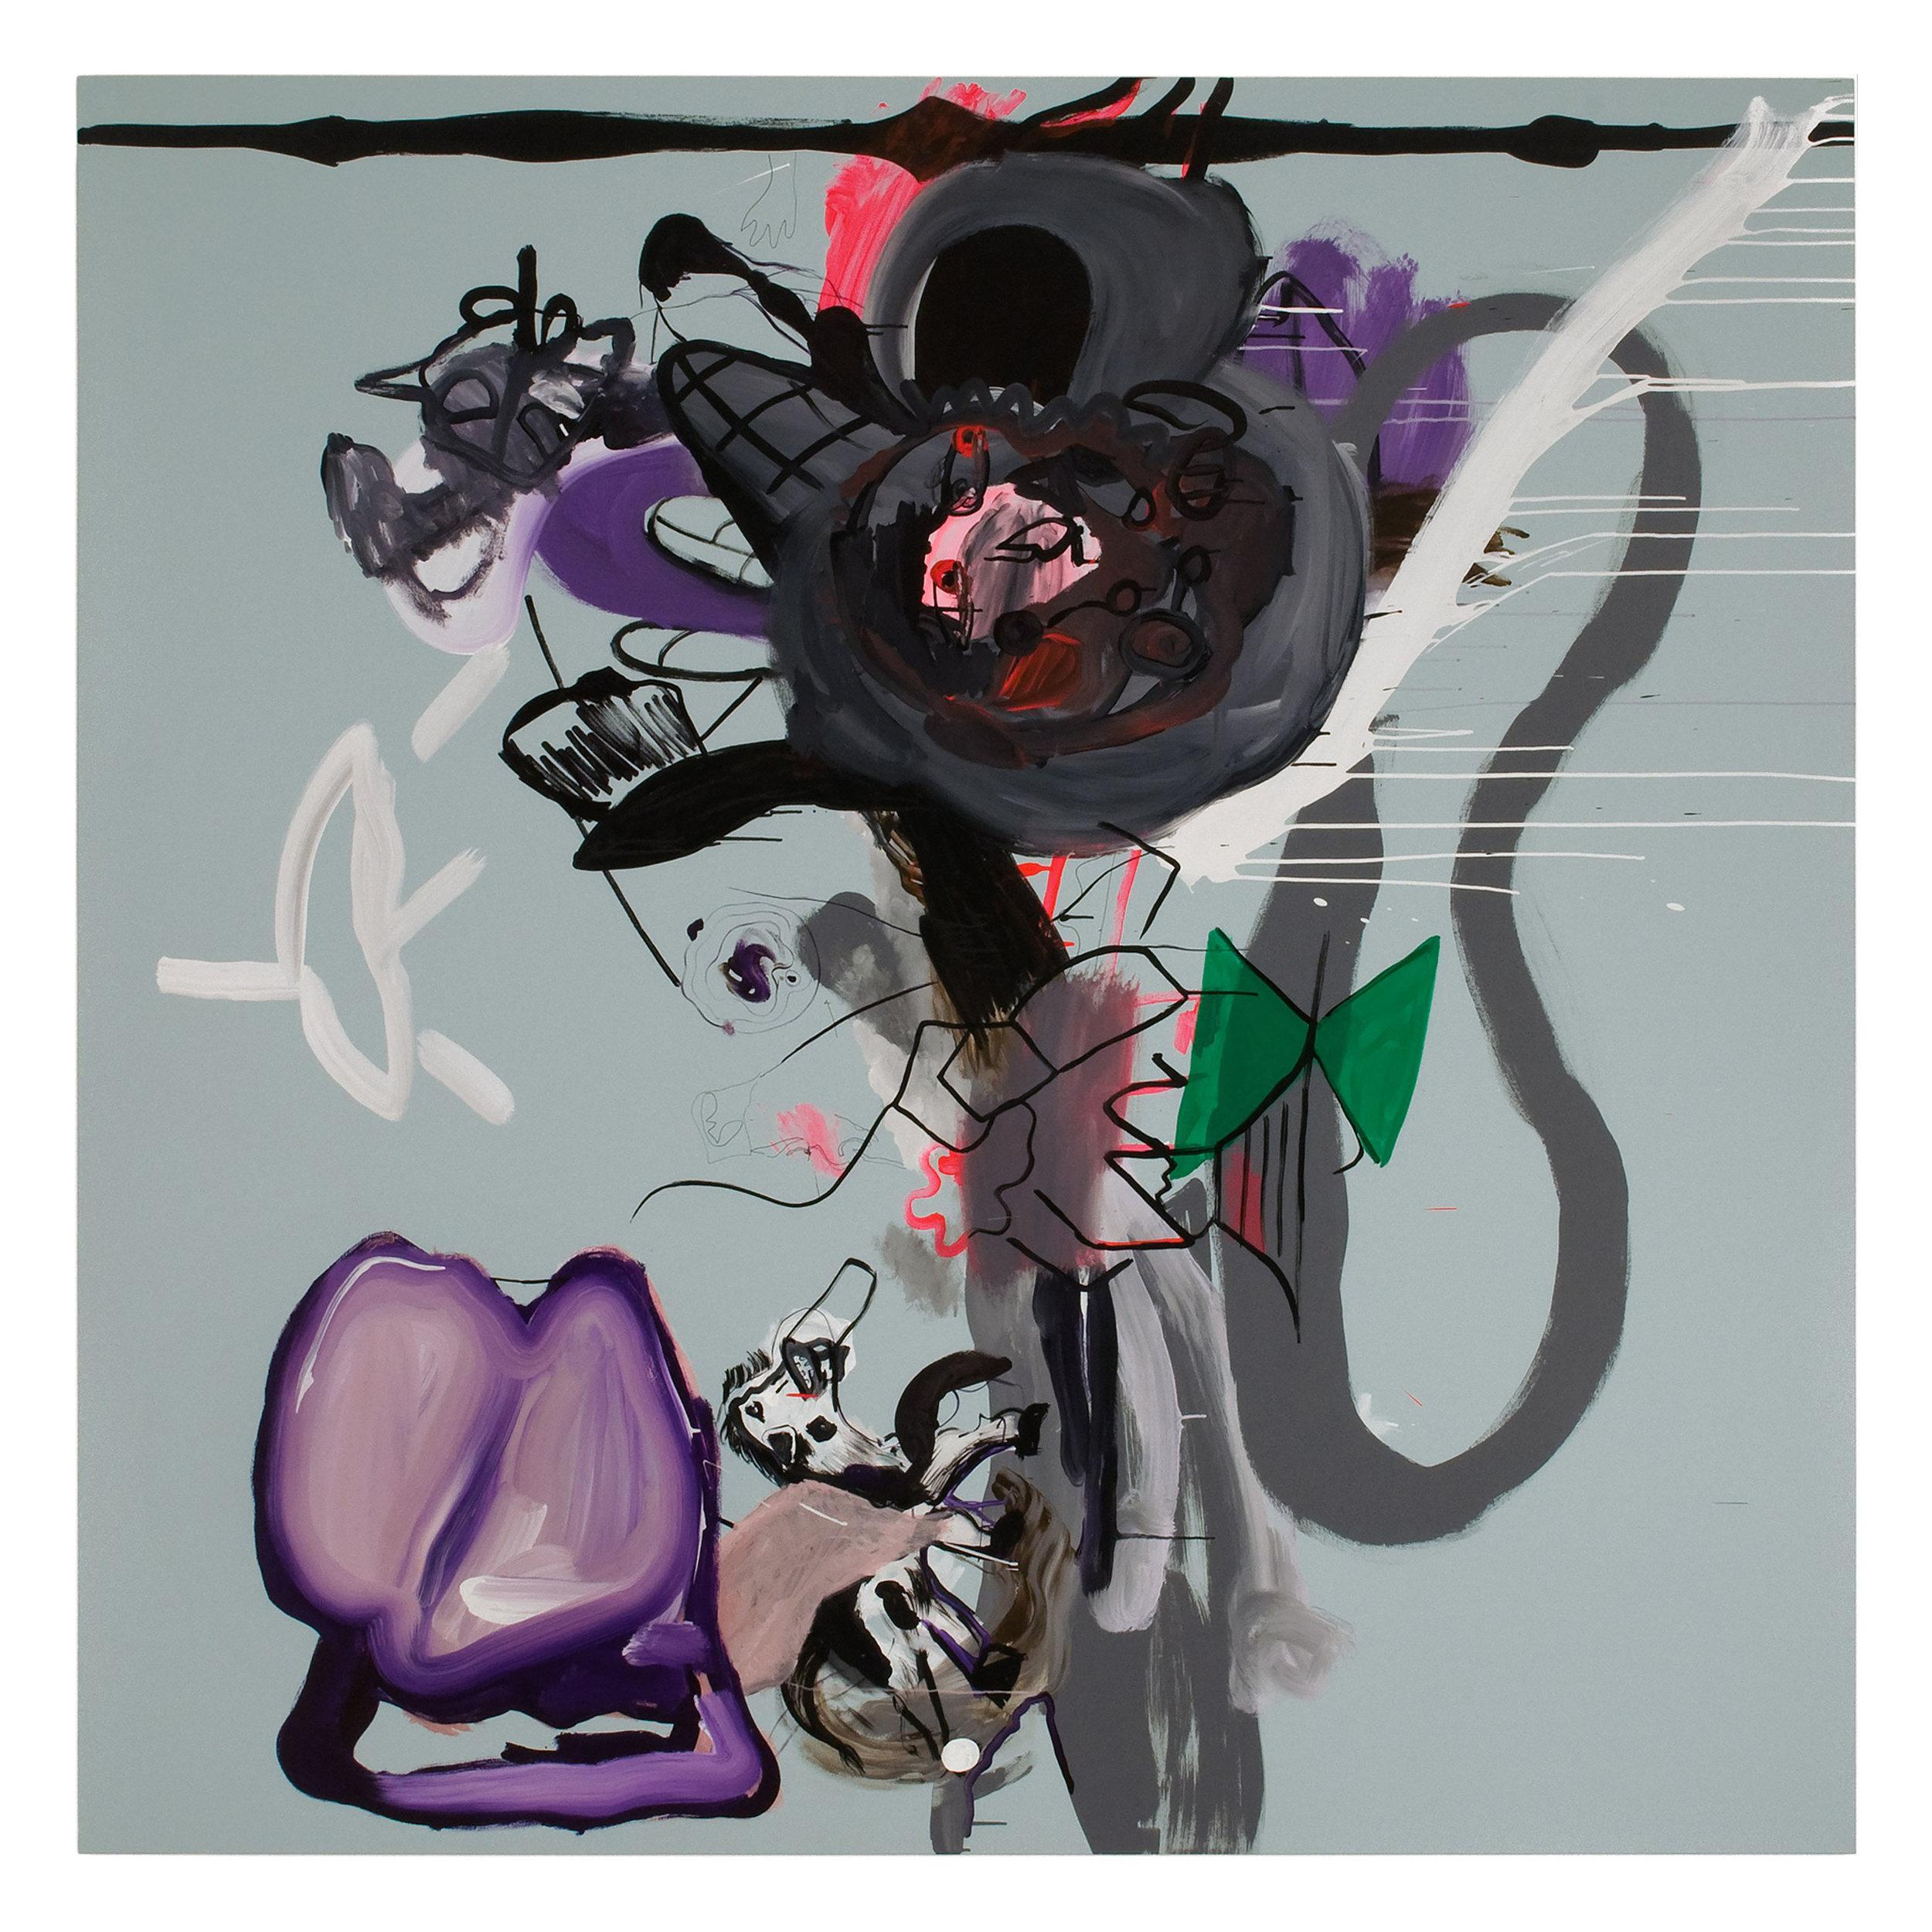 Drew Beattie  Secret Mouse  2010 acrylic on canvas 96 x 96 inches